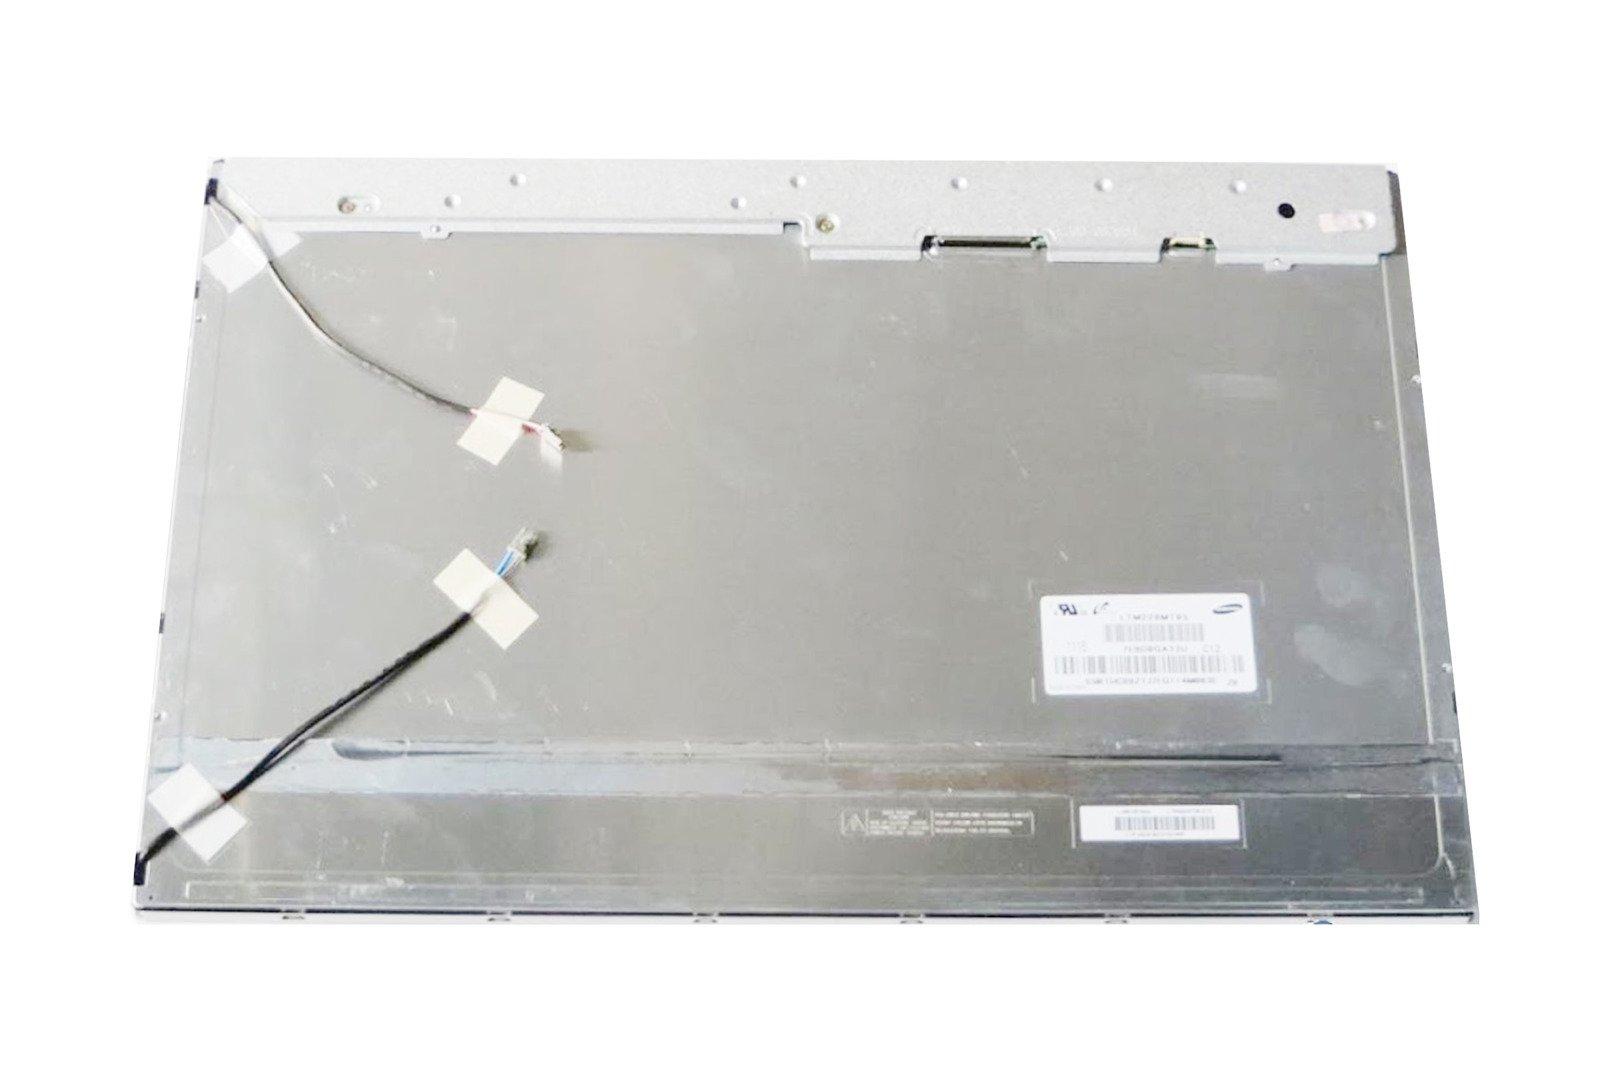 Display Panel Screen Samsung 22' LTM220MT05 1680 x 1050